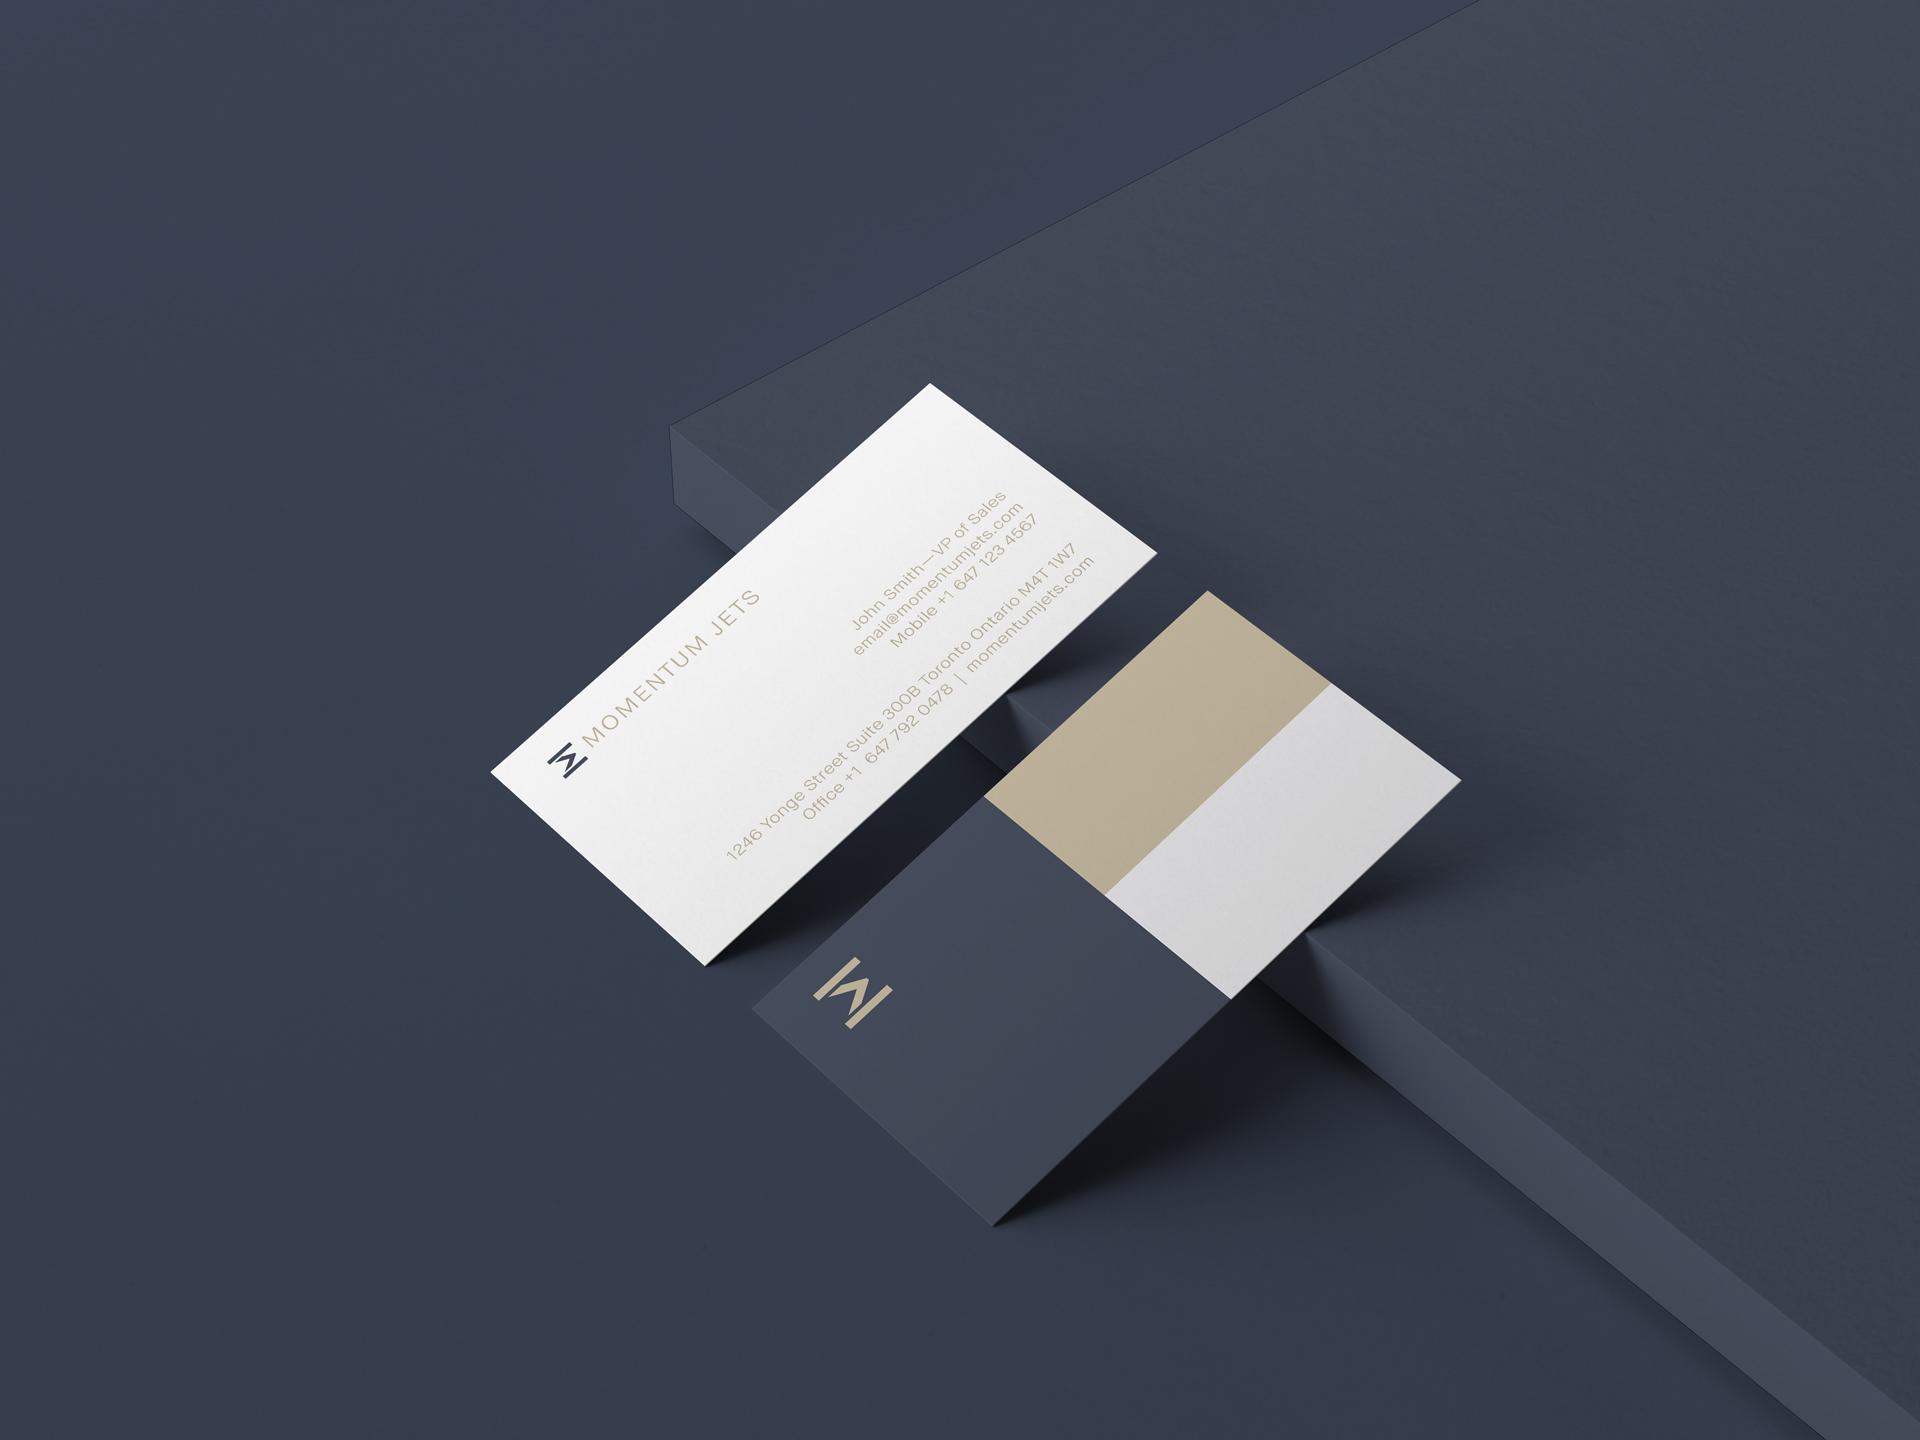 Momentum Jets business card design